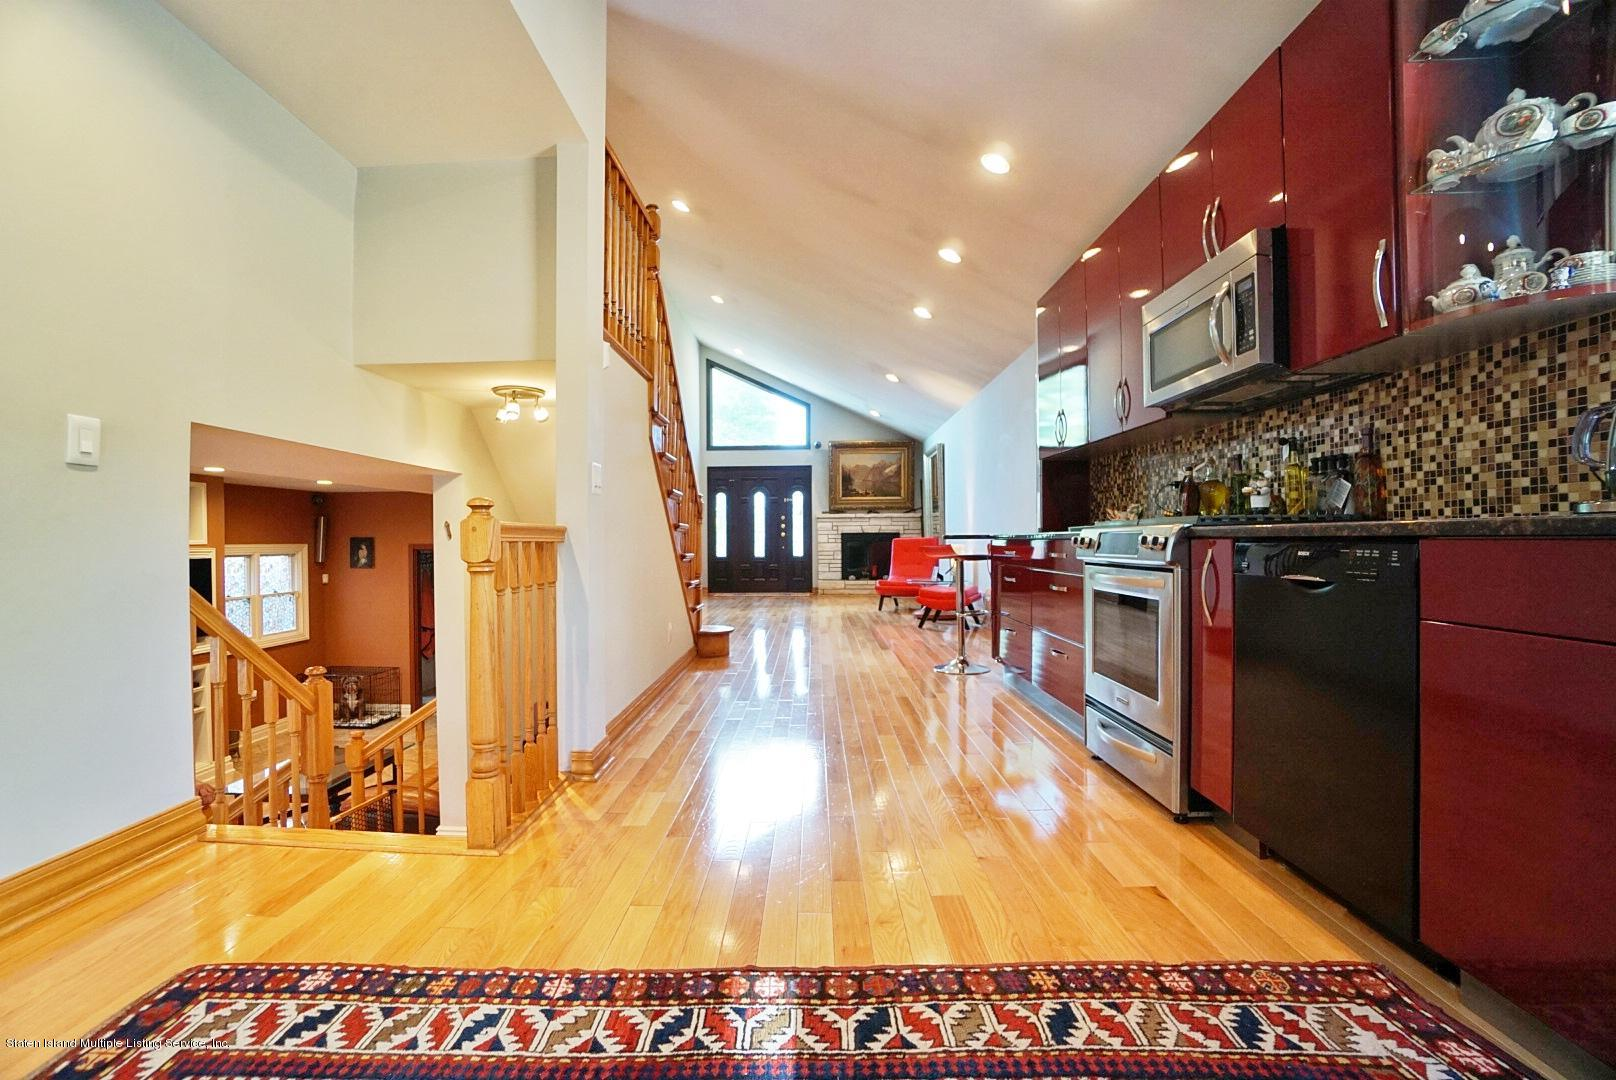 Single Family - Detached 48 Ocean Terrace  Staten Island, NY 10314, MLS-1130826-24